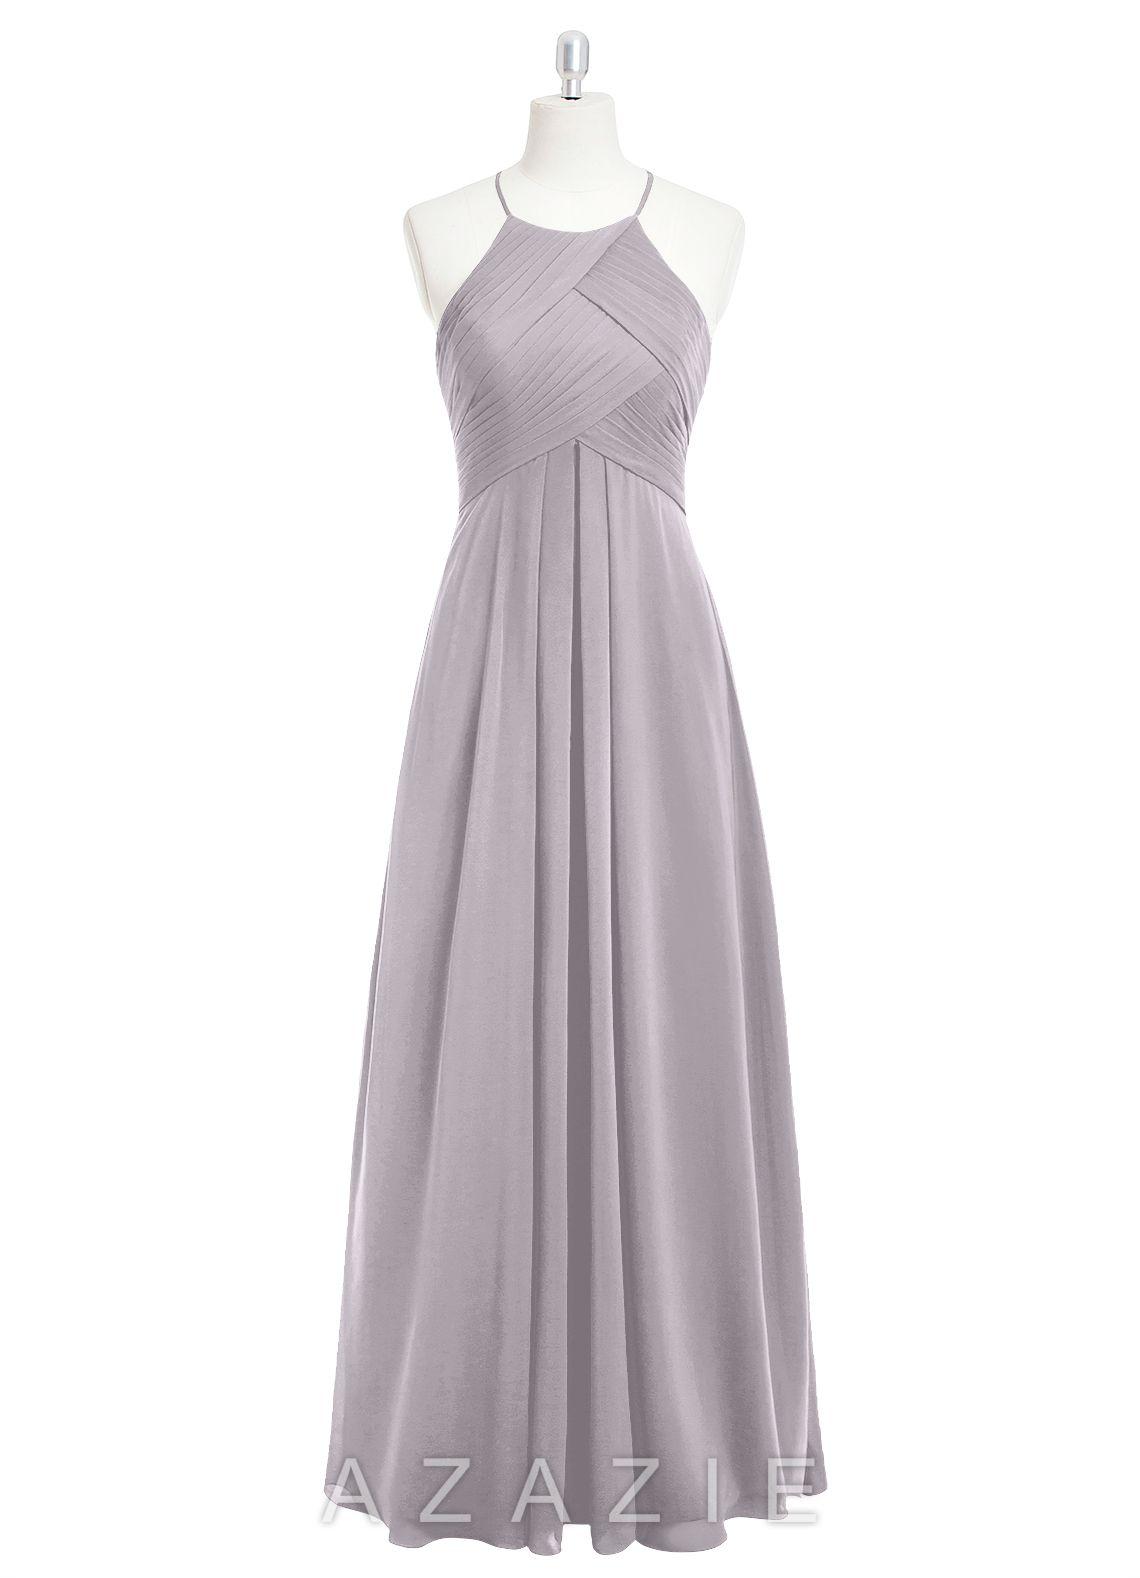 GINGER - Bridesmaid Dress | Brautjungfer